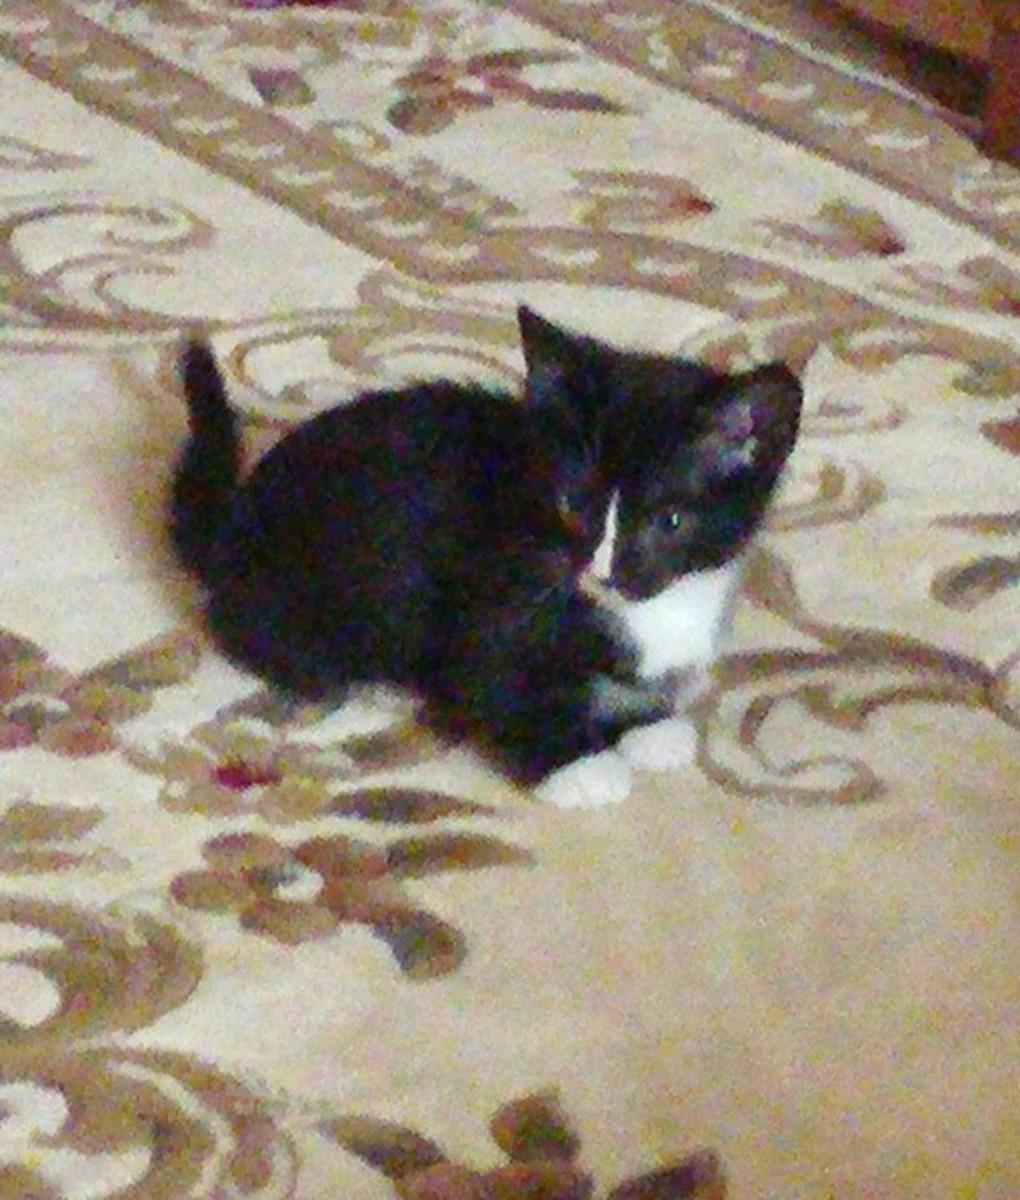 Our tuxedo munchkin kitten, Diego